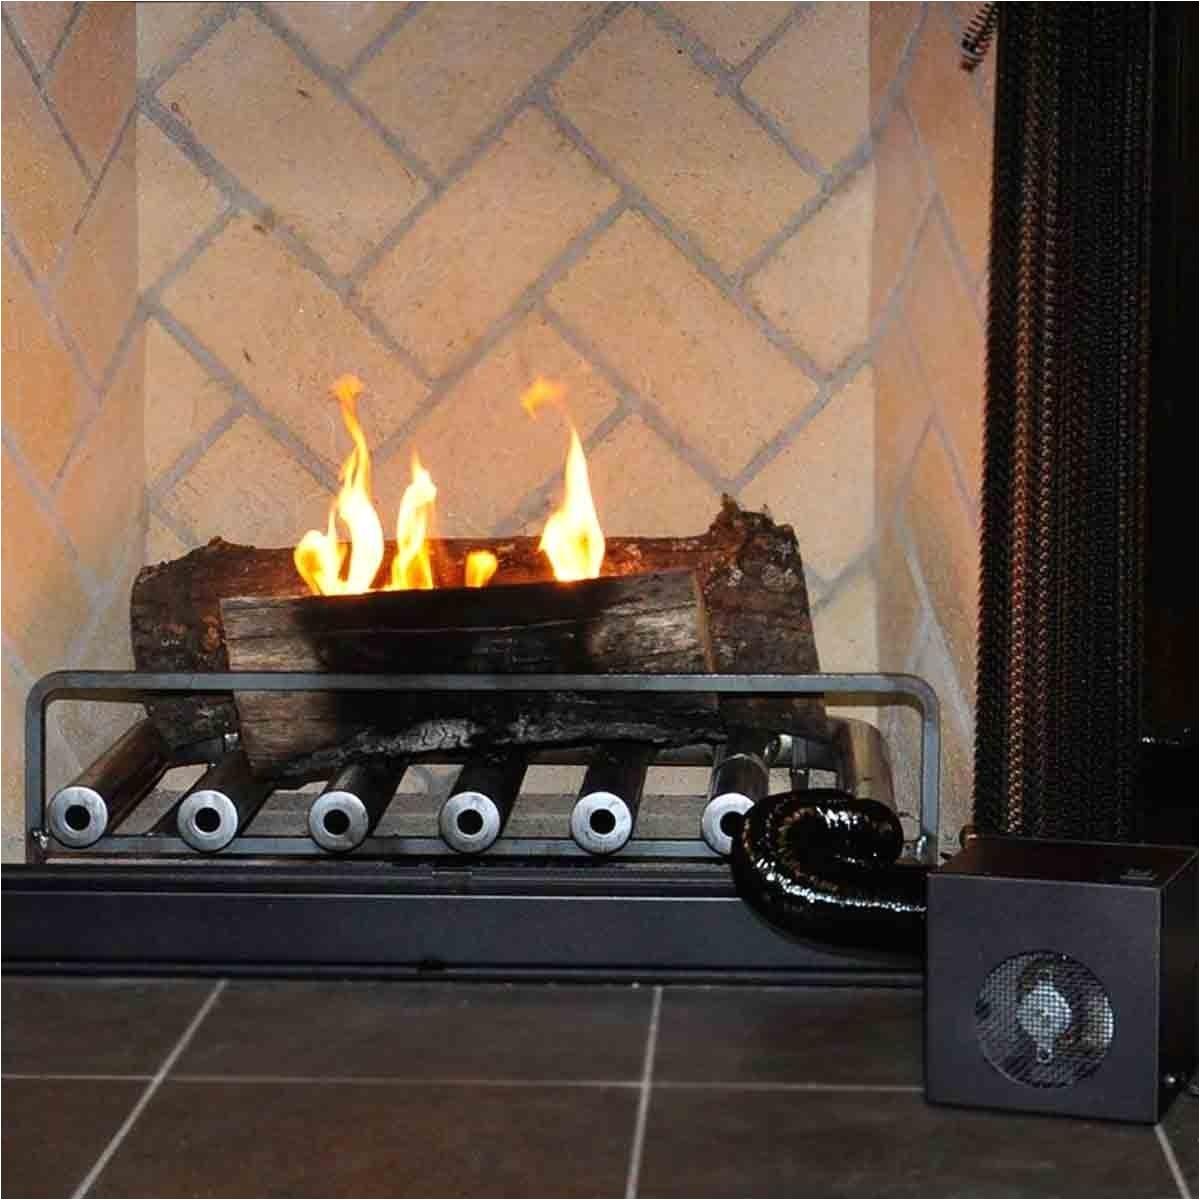 spitfire fireplace heater 6 tube w blower